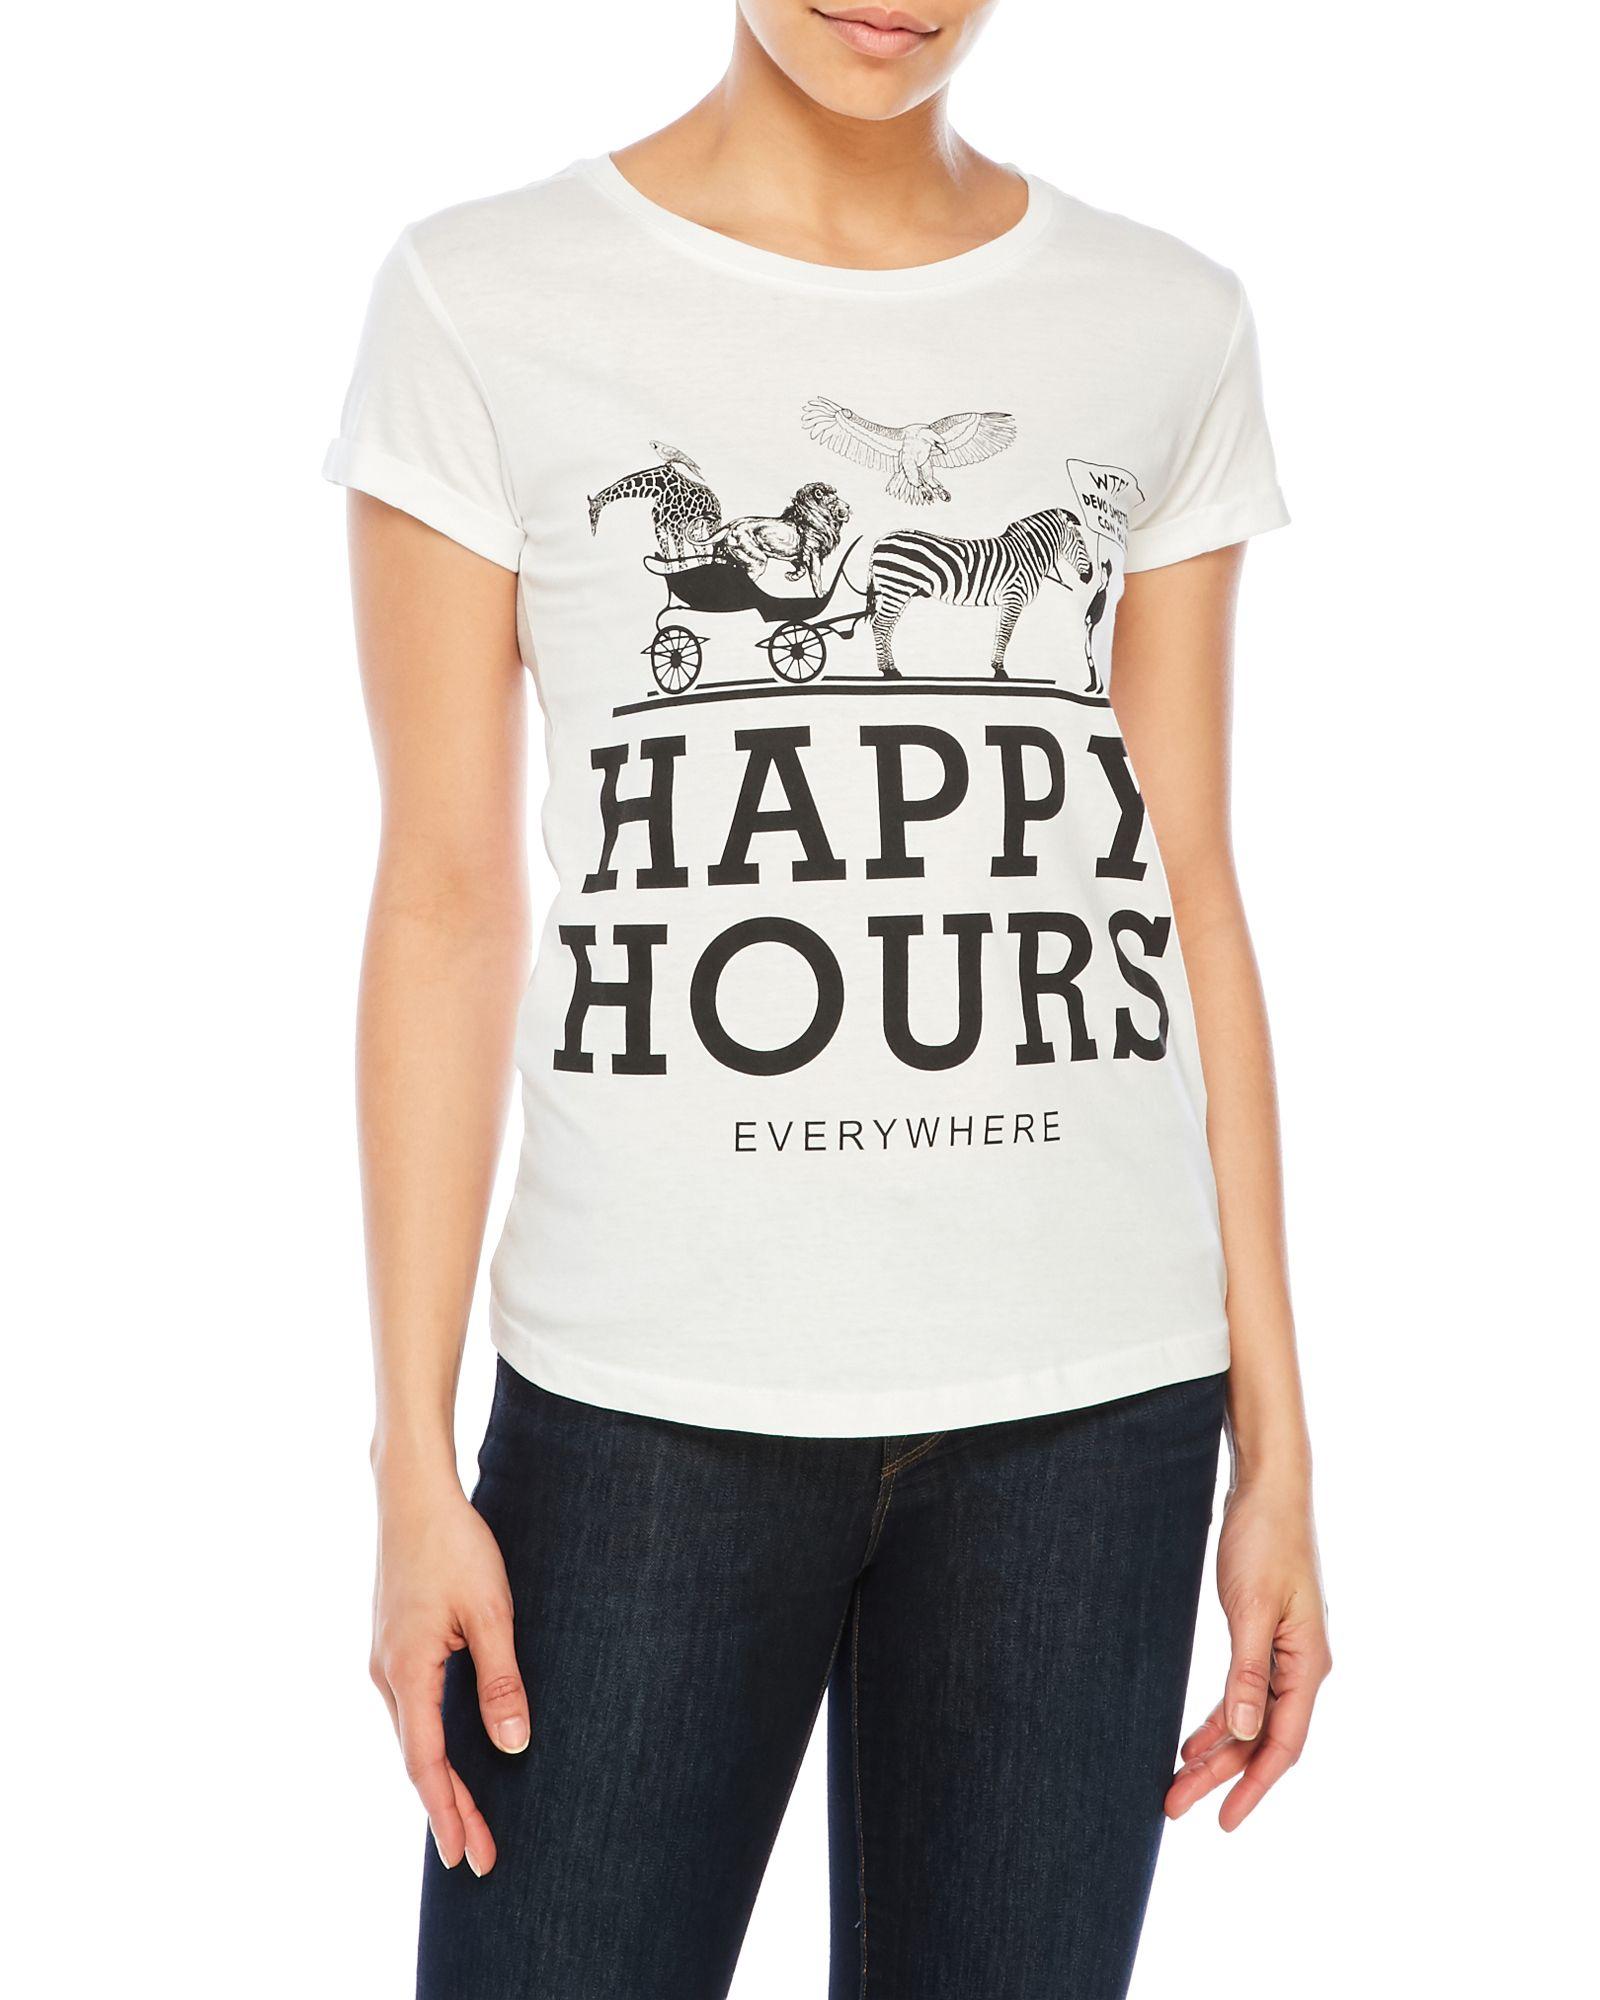 Happiness Happy Hour Graphic Print Tee